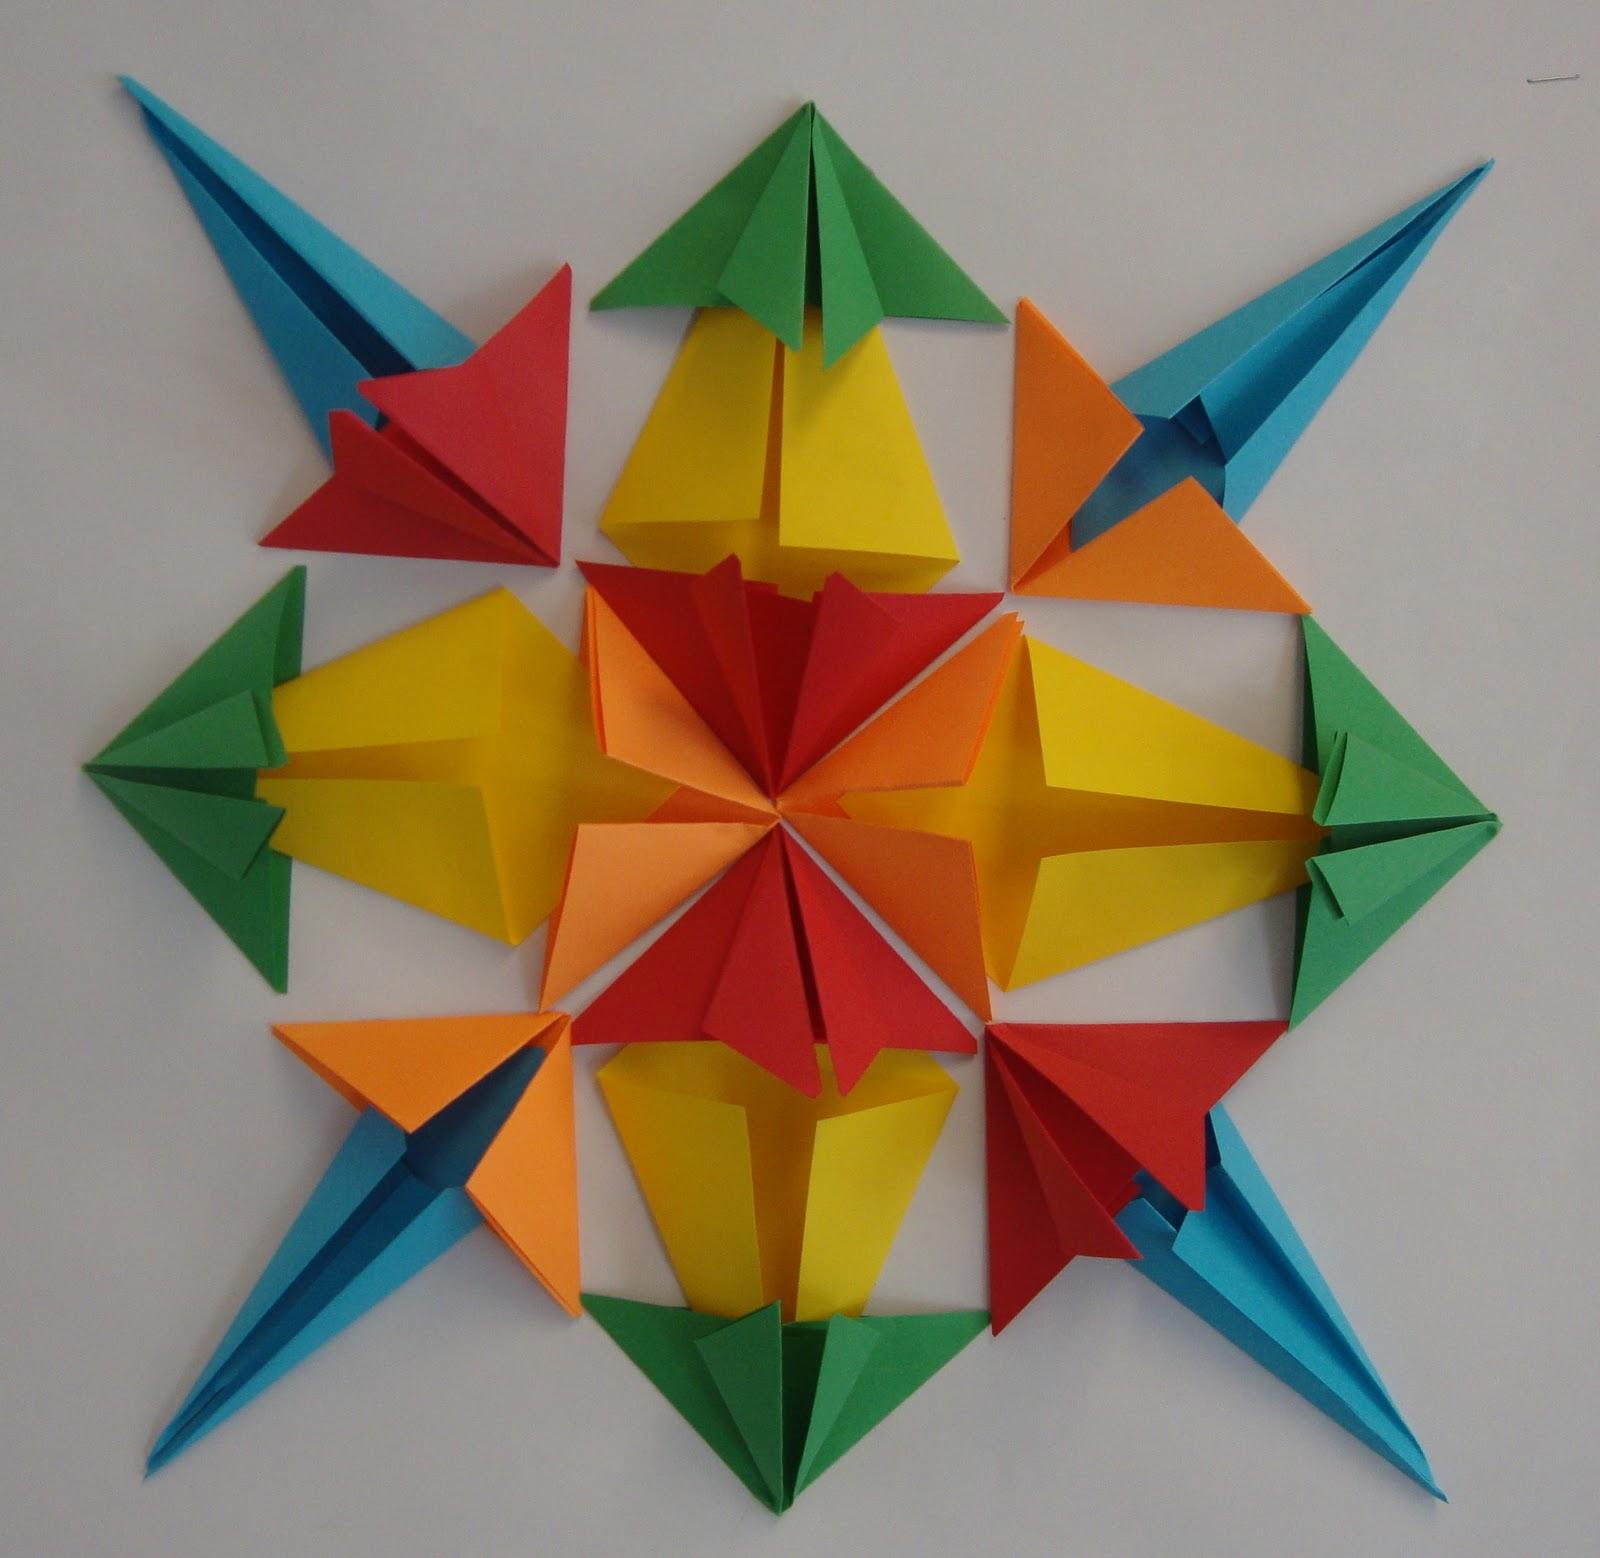 Art paper scissors glue symmetrical origami jeuxipadfo Images